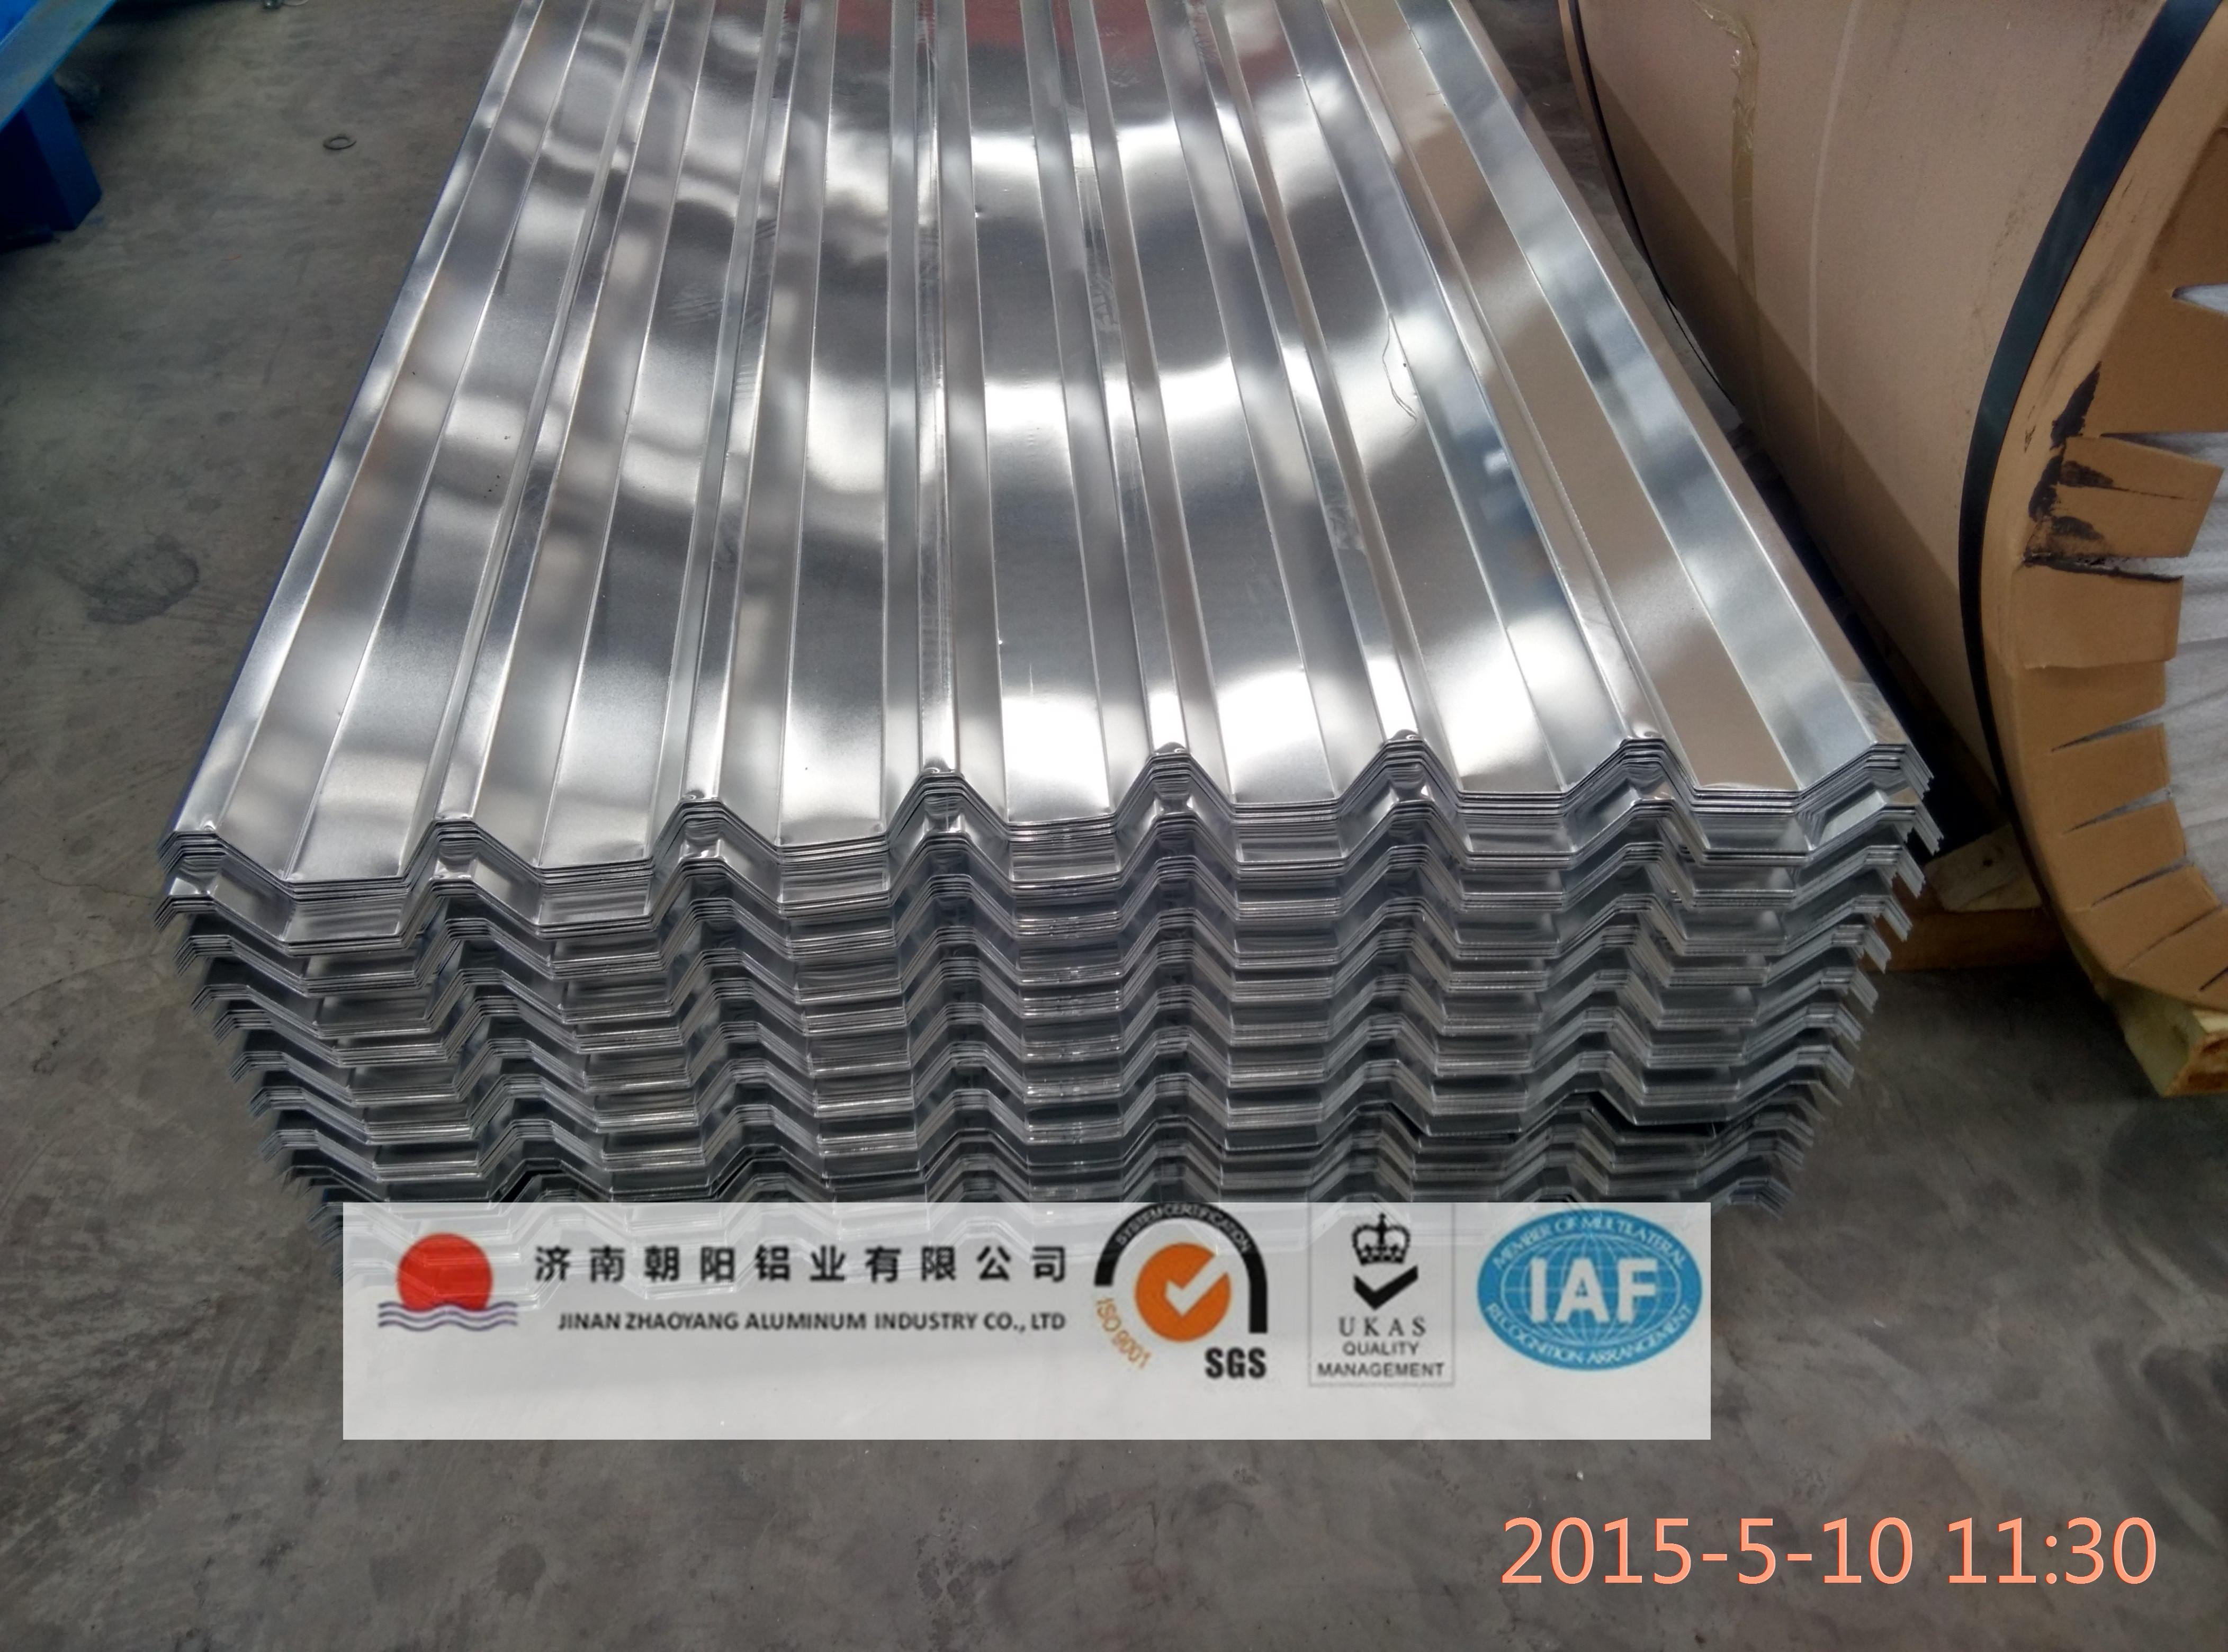 3A21材质防腐防锈铝合金压型铝瓦 3A21合金压型铝瓦也能用3003材质的代替,因为3a21和3003牌号中锰的含义是一样的 稍微有点区别的铜含量:3003是0.02-0.2,3A21是不超过0.2,所以3003的完全可以代替 3A21的 如何选择瓦楞铝板(铝瓦)合金及颜色合金选择:铝瓦用铝合金化学成分参照国家标准GB/T 3190-2006标准,按照合金成分,1050及1060属于纯铝,铝含量在99.